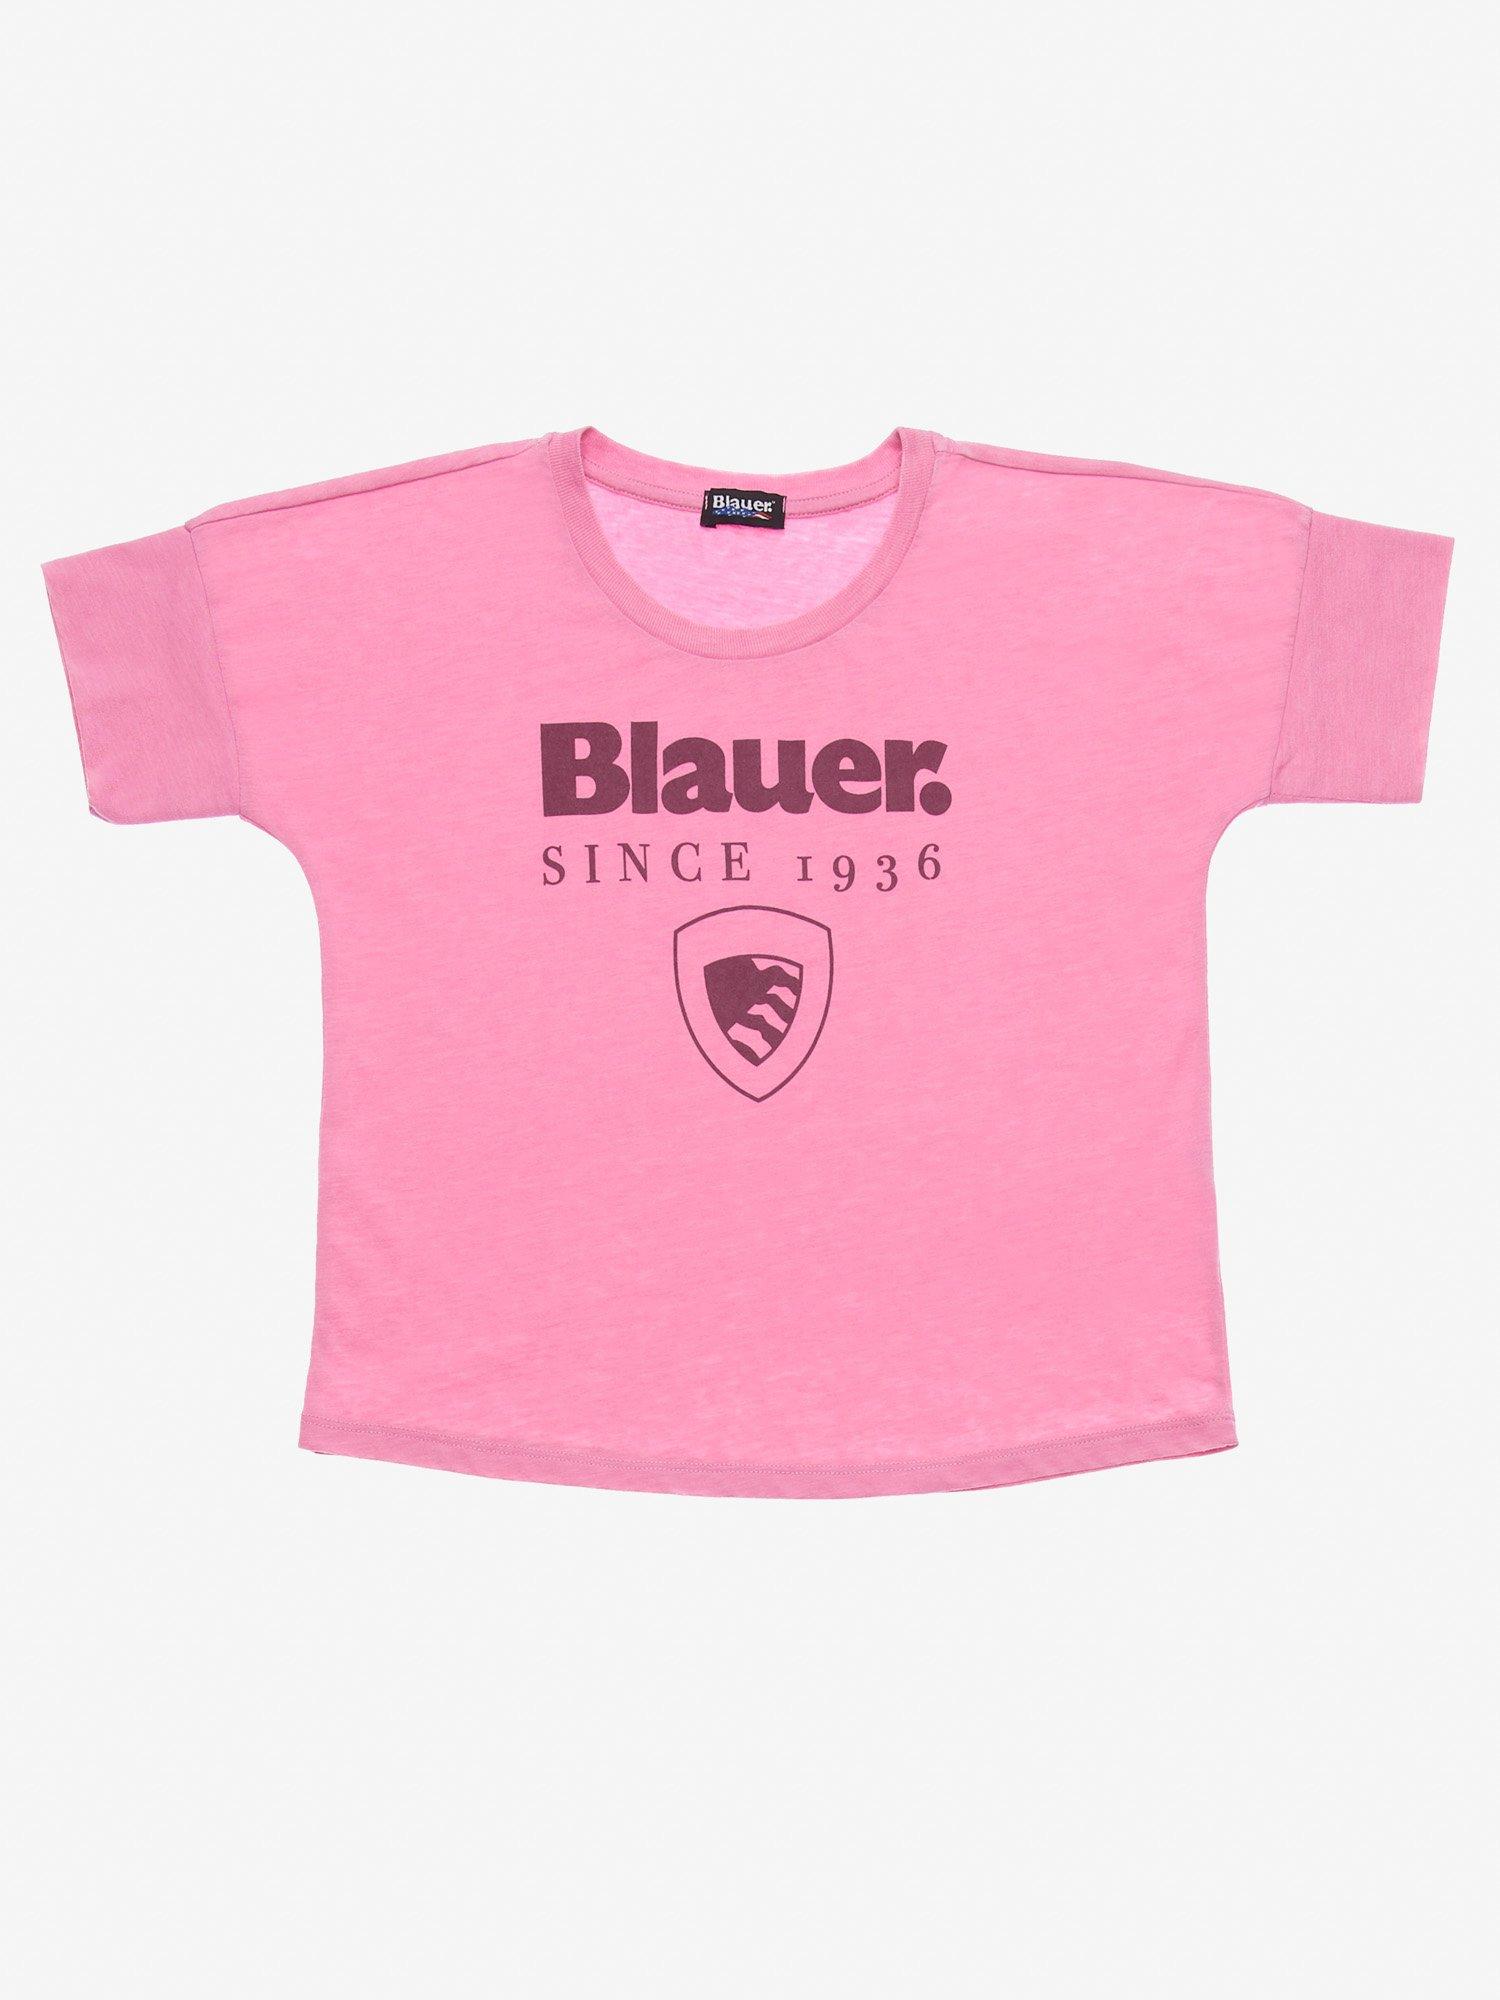 T-SHIRT JUNIOR TANZ - Blauer